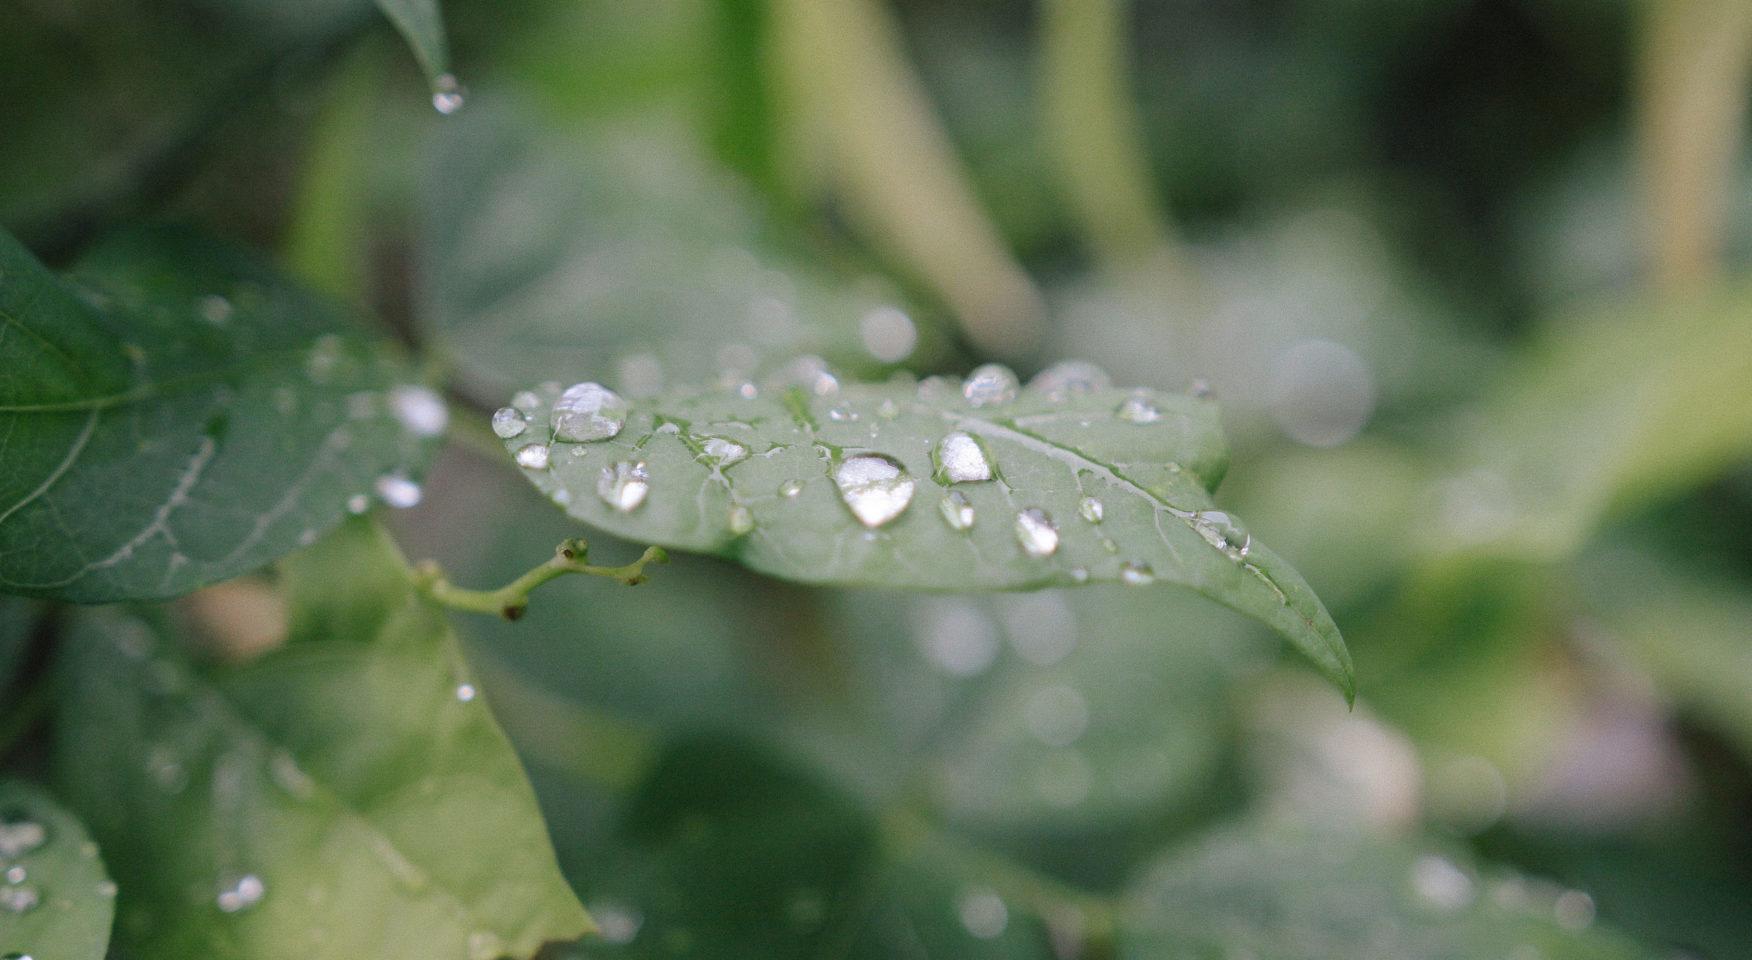 closeup of dew drops on green leaf